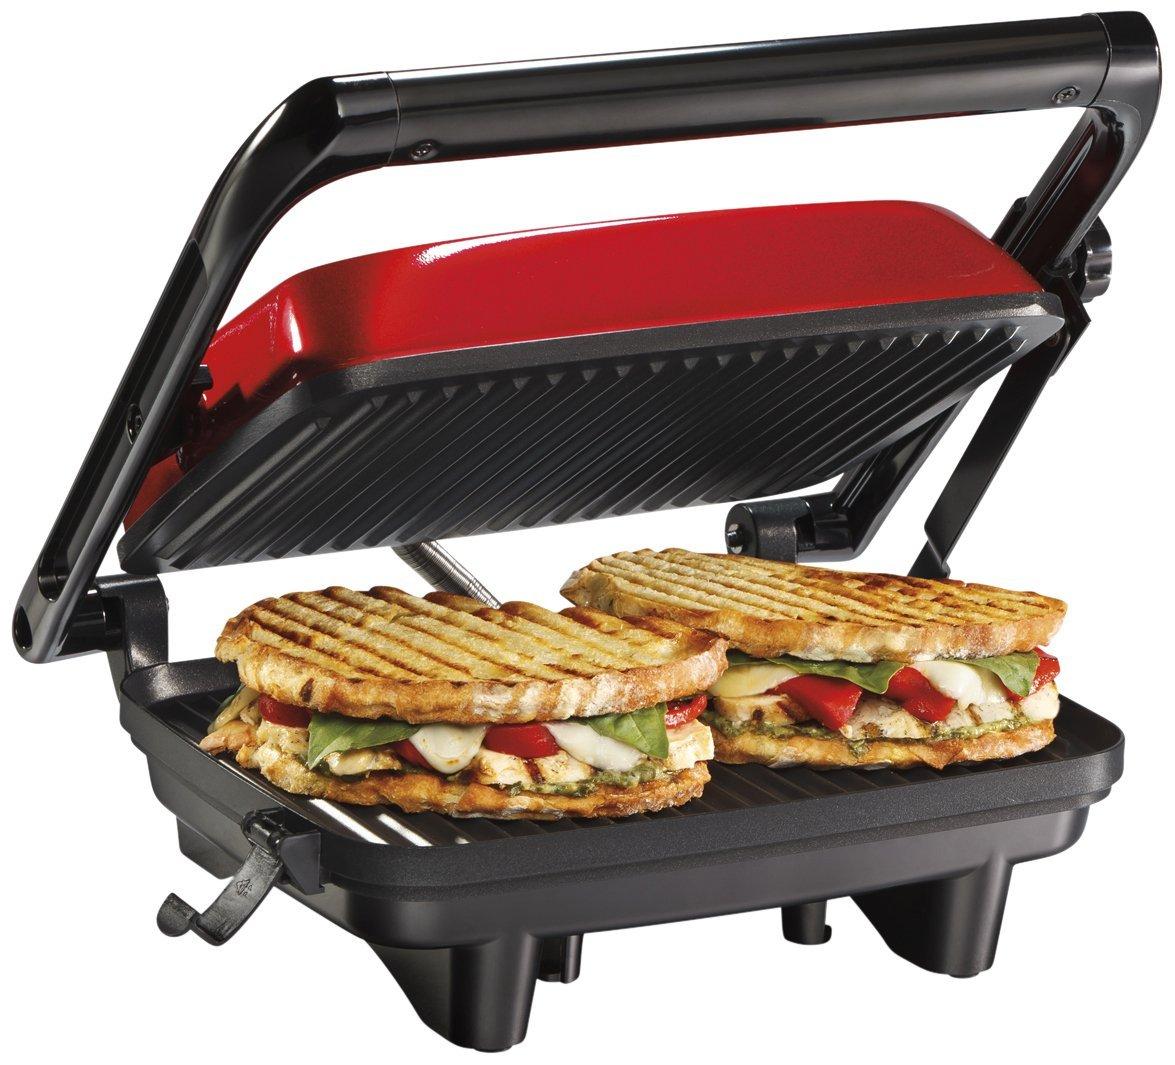 Hamilton Beach 25462Z Panini Press Gourmet Sandwich Maker Renewed